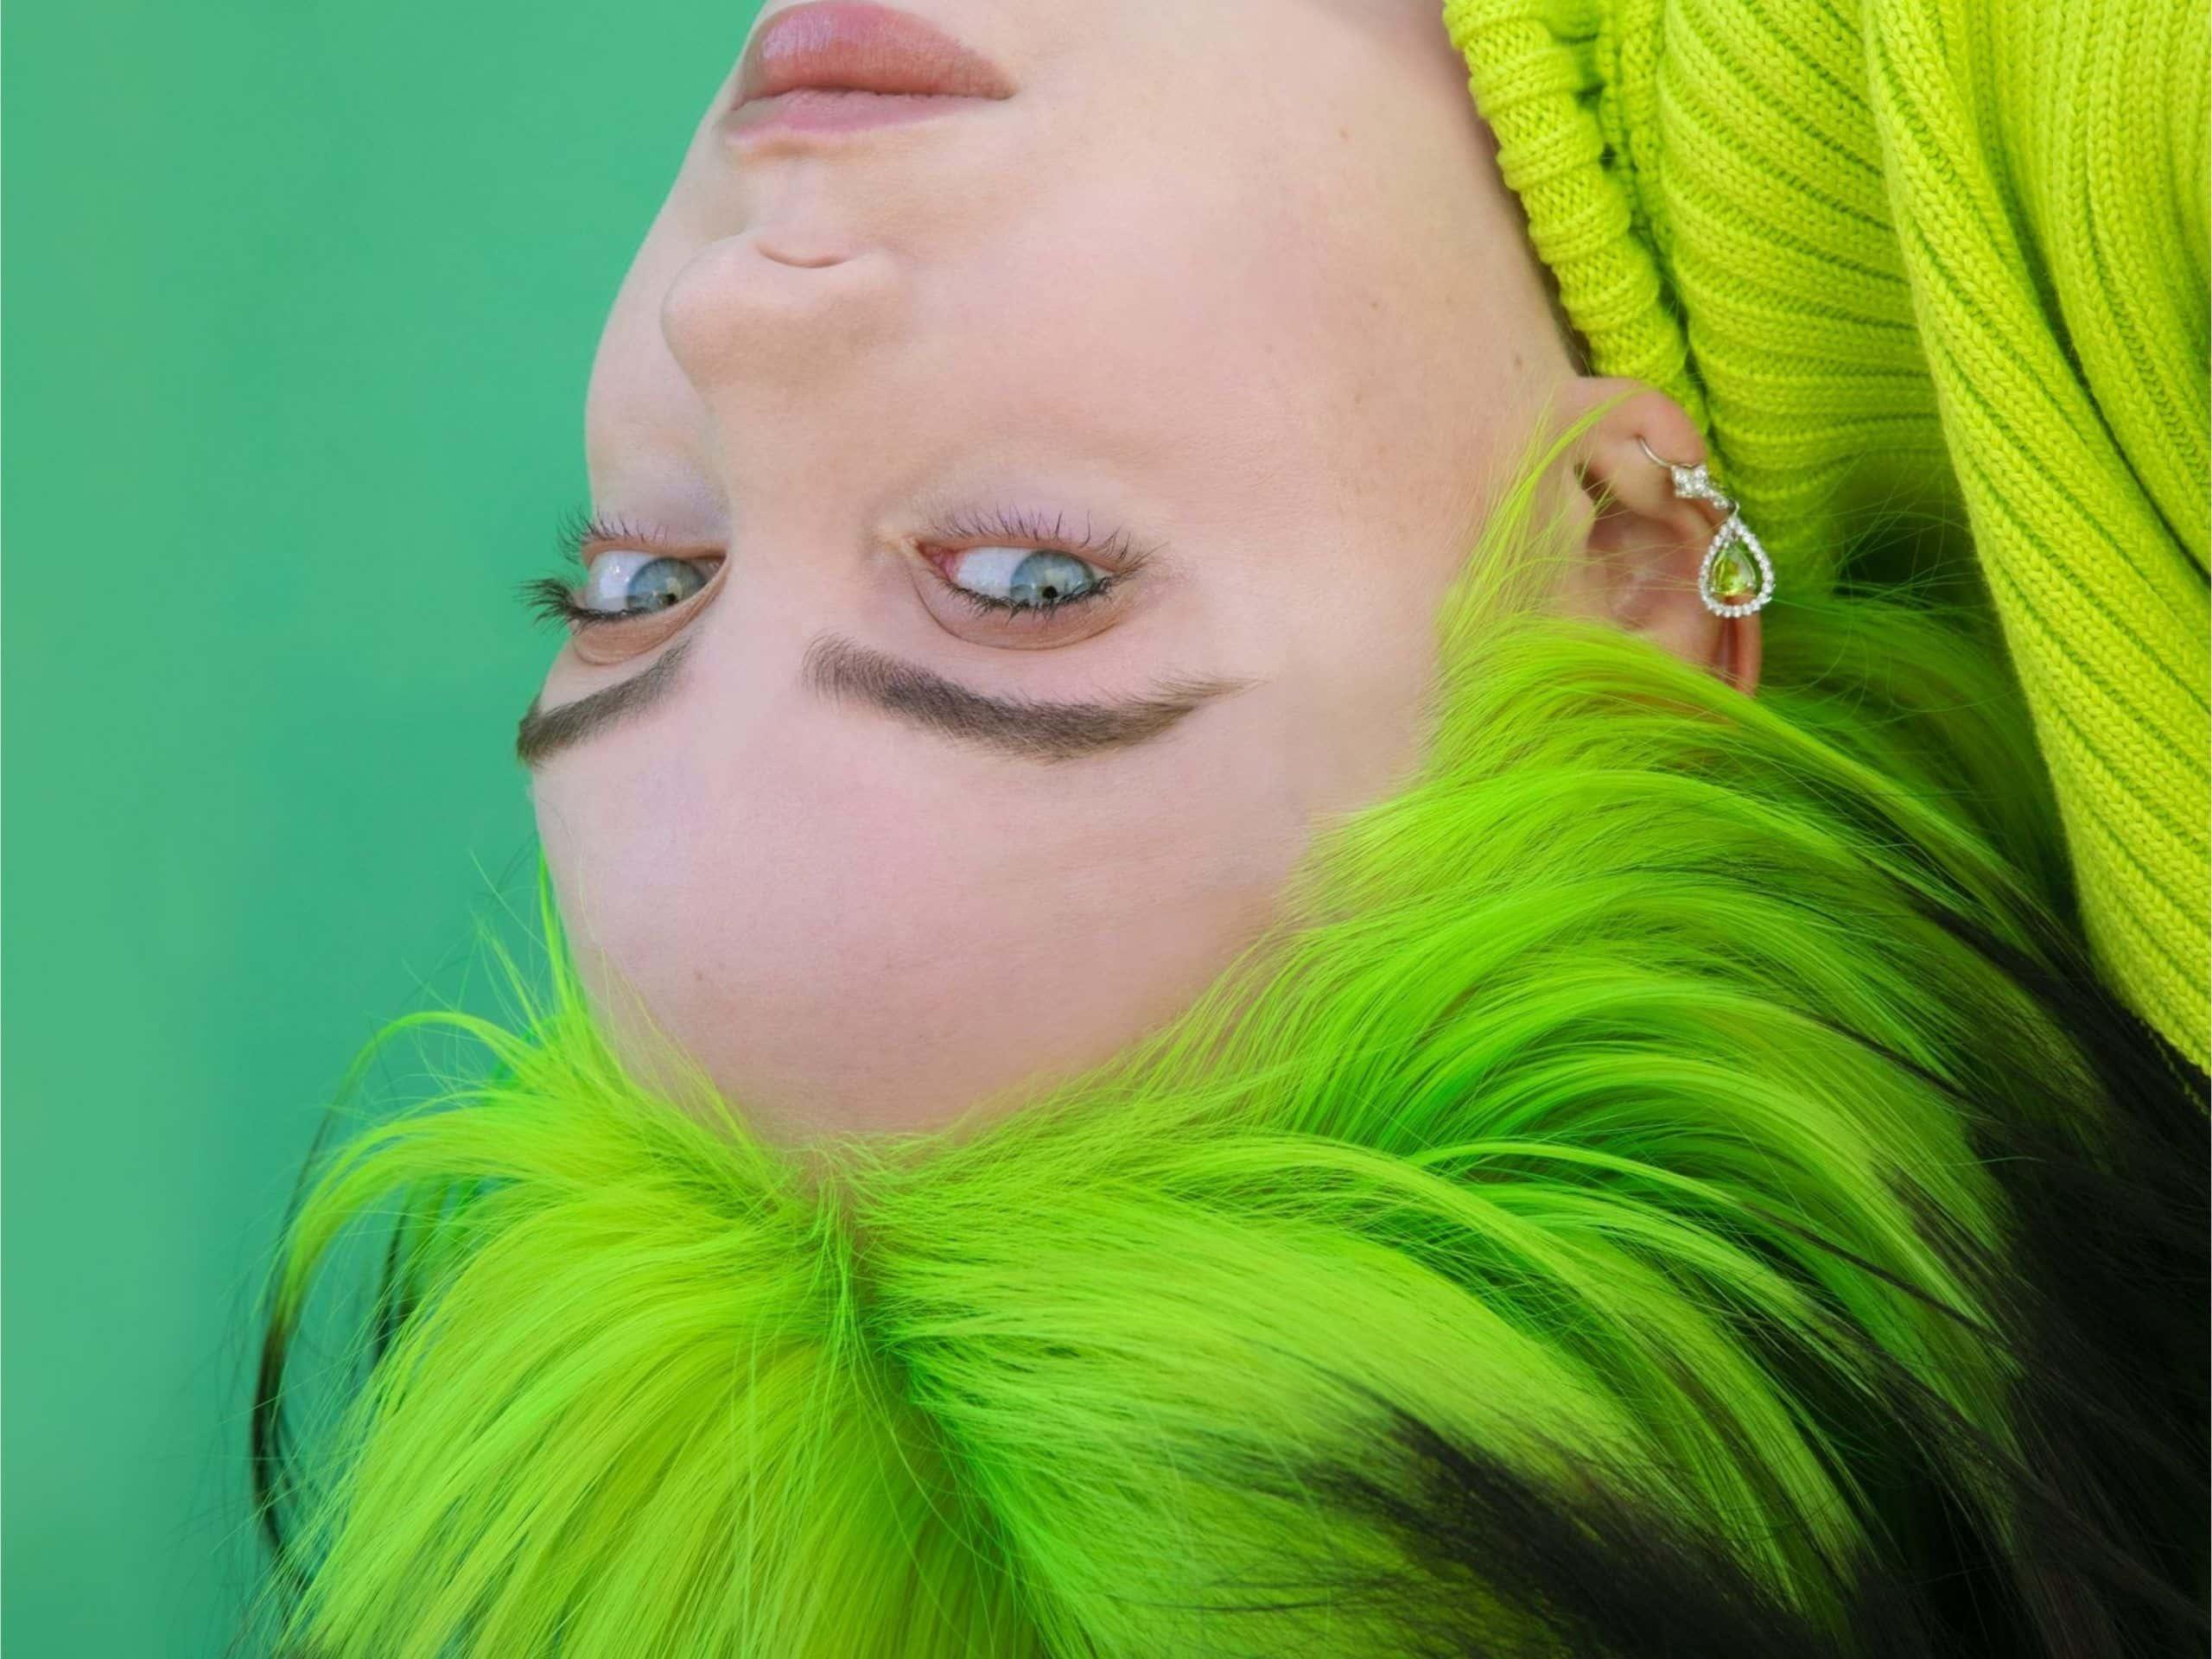 Hair color block Billie Eilish